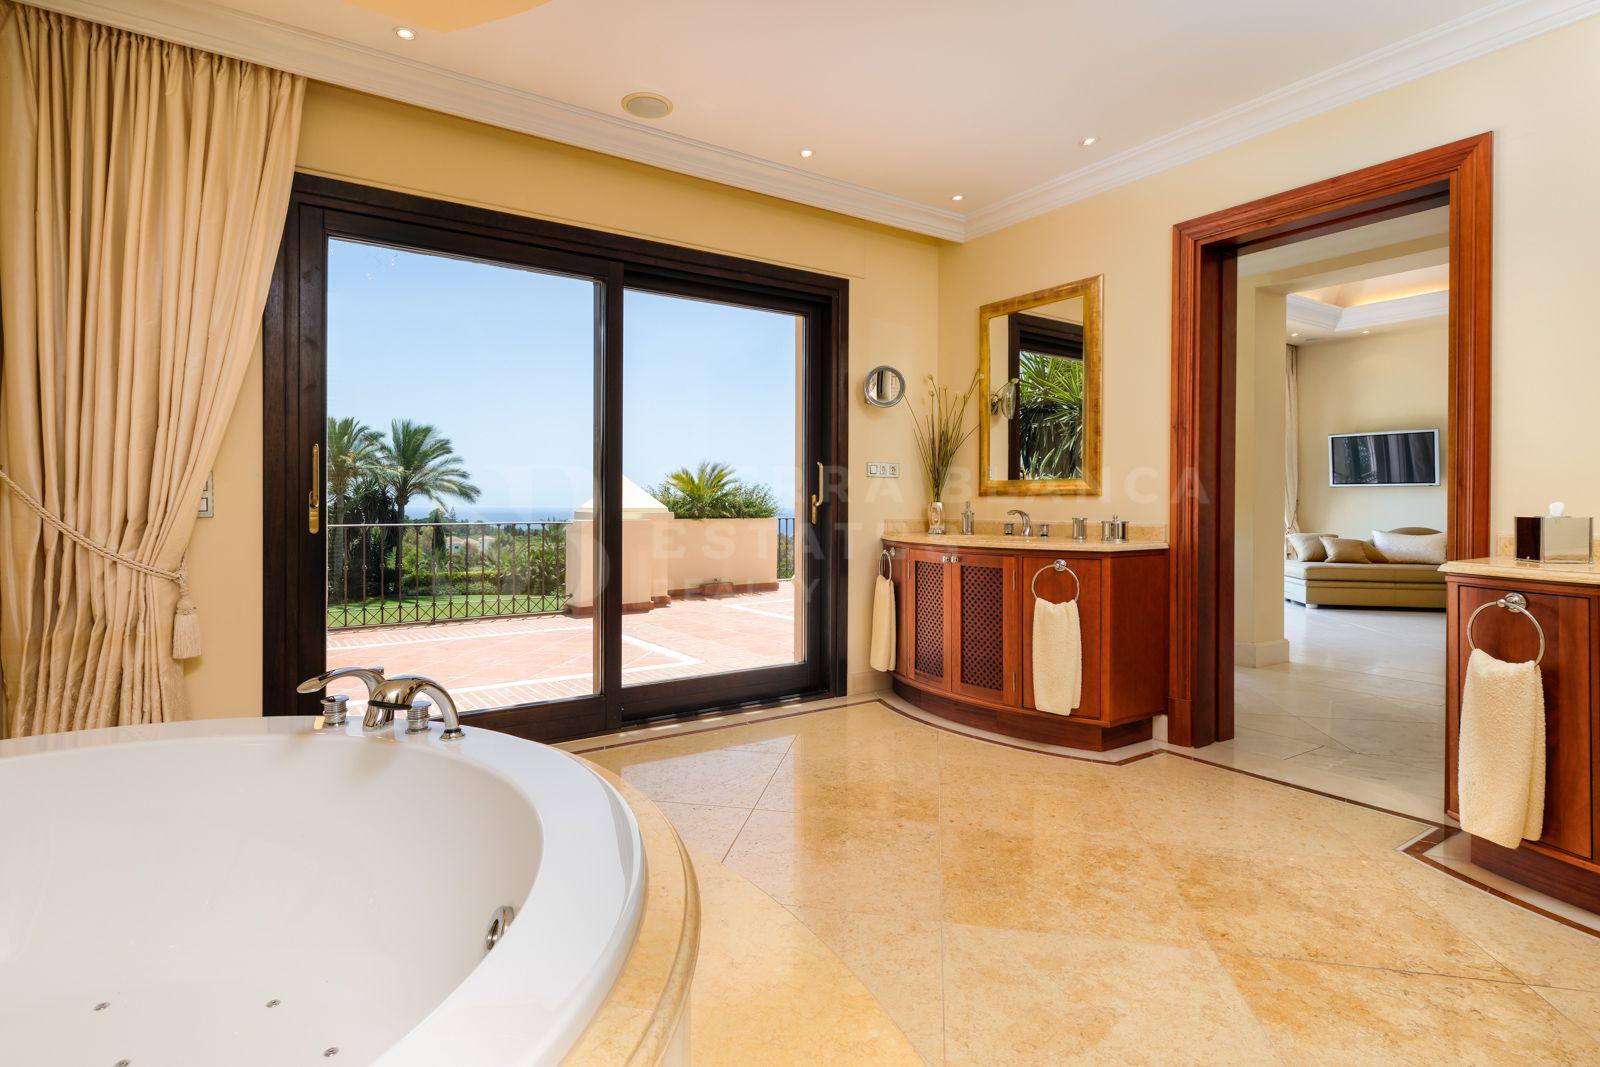 Villa de style classique exquise à Marbella Hill Club